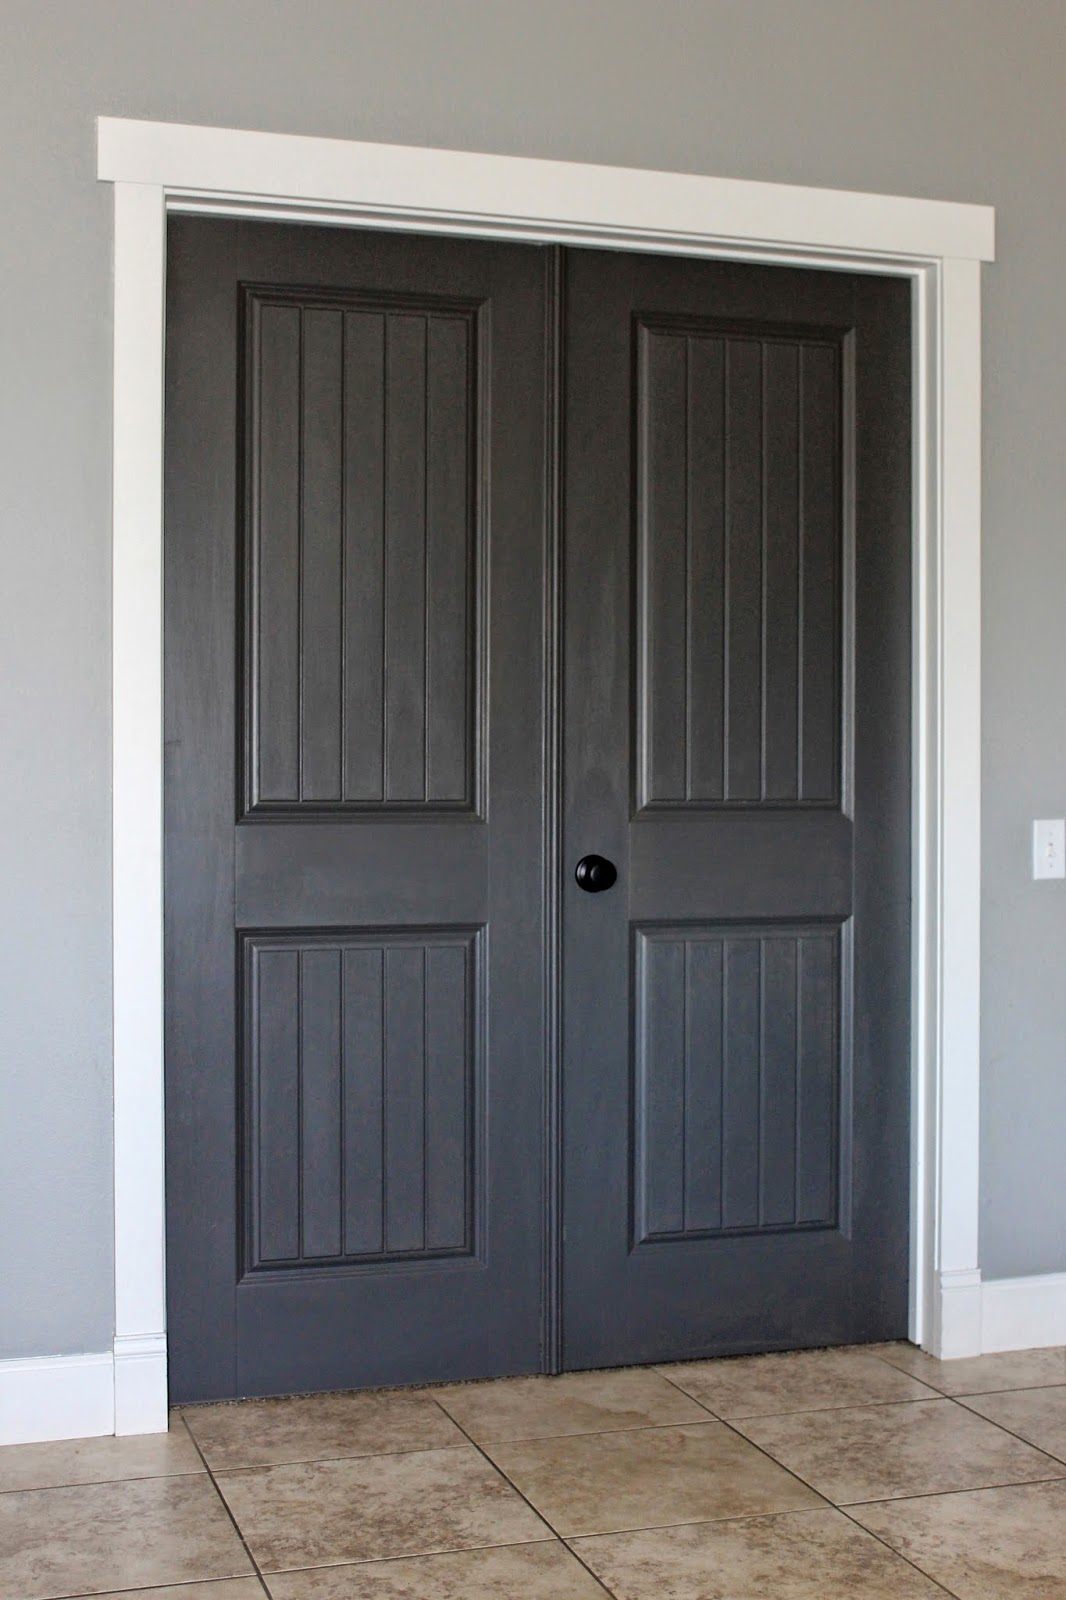 (via From the Carriage House) & White Trim Dark Paint -\u003e Why I\u0027m Going Dark With My Doors ...